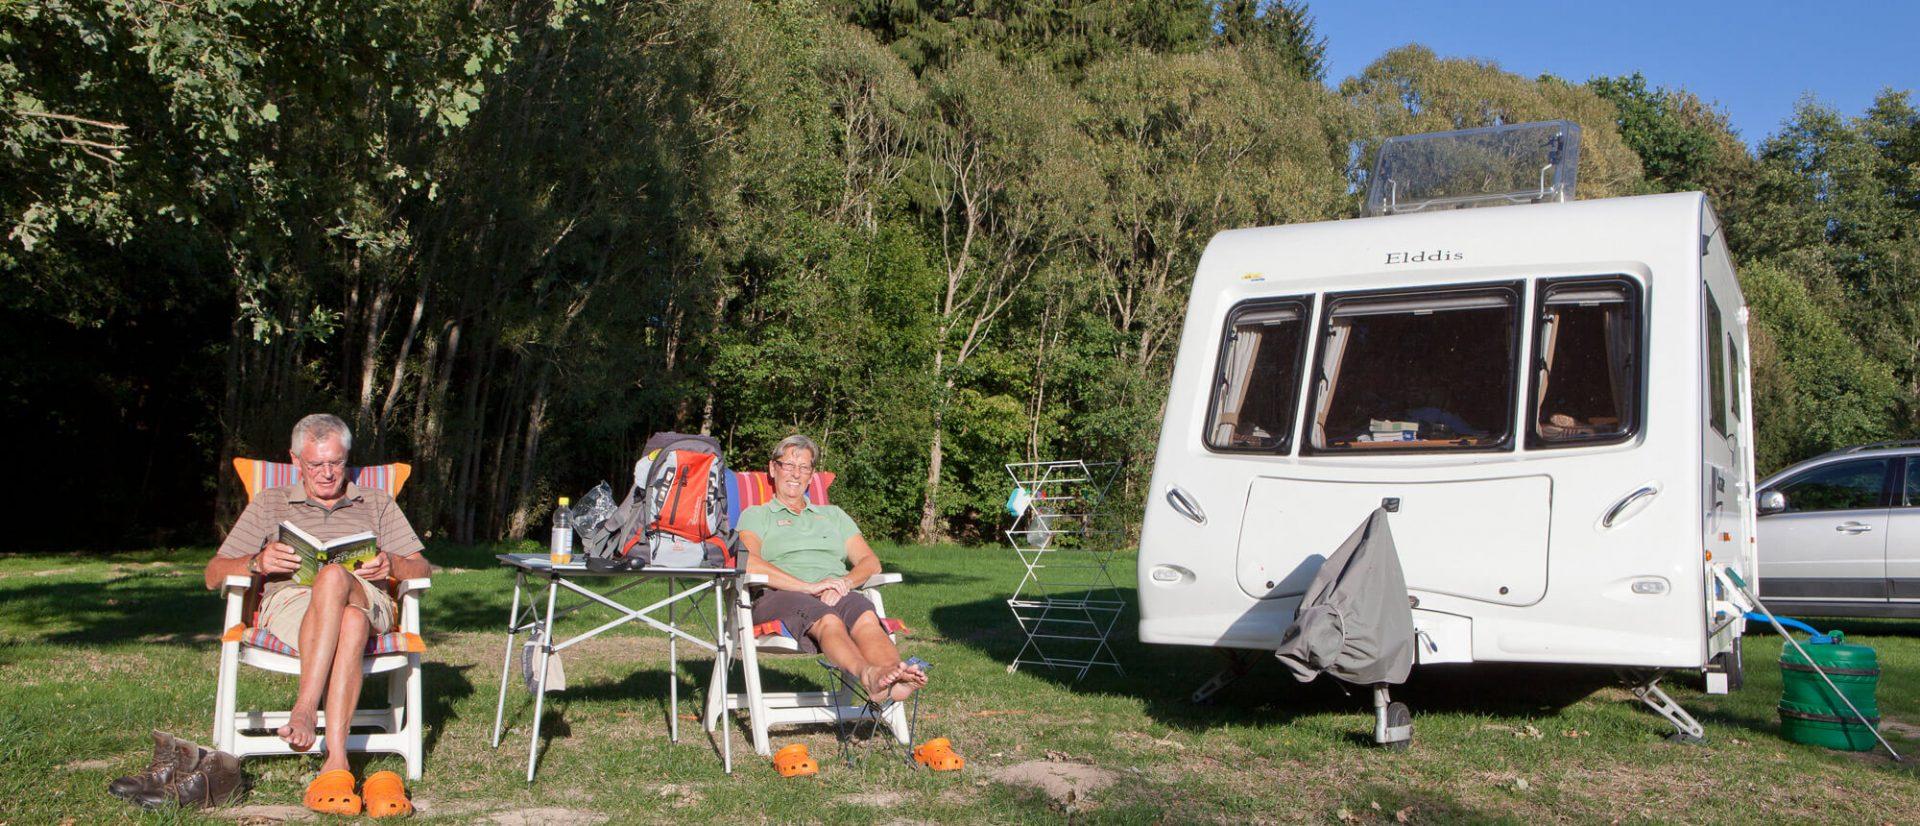 Camping Clos De La Chaume : Emplacement Confort Camping Au Clos De La Chaume Vosges Camping